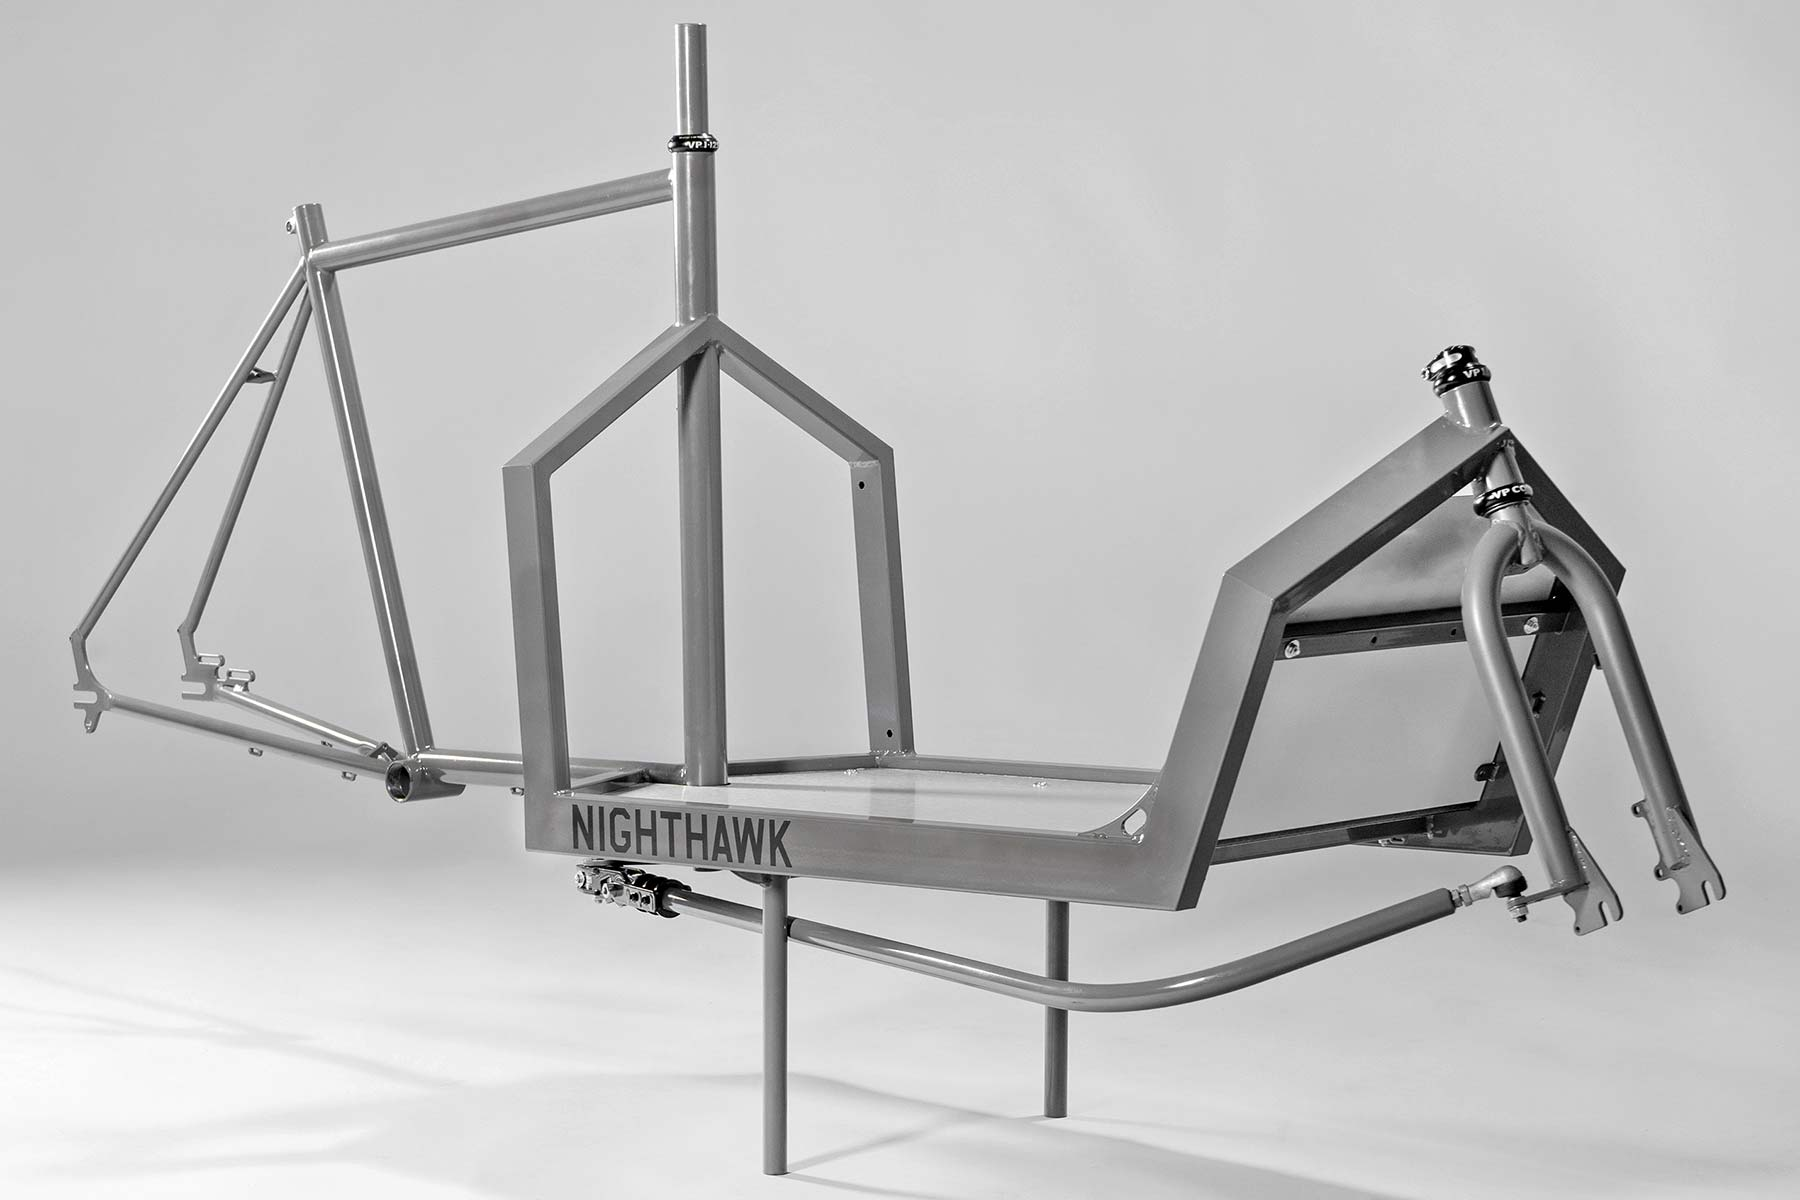 KP Cyclery Nighthawk steel cargo bike, affordable EU-made customizable long john cargo bikes,frame angled